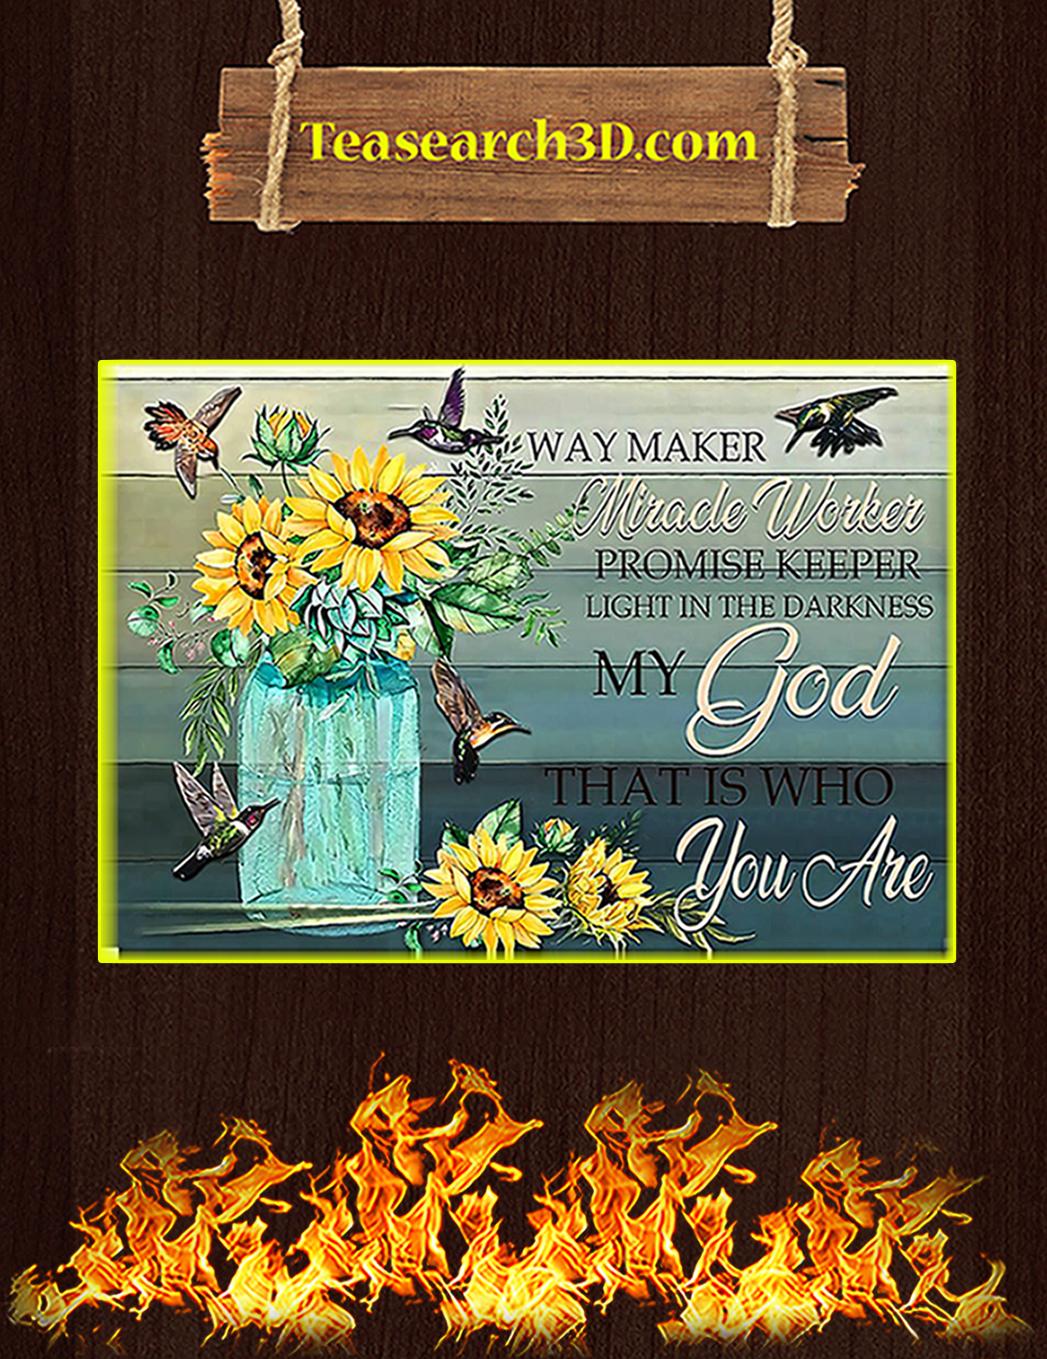 Hummingbird sunflower way maker miracle worker poster A1